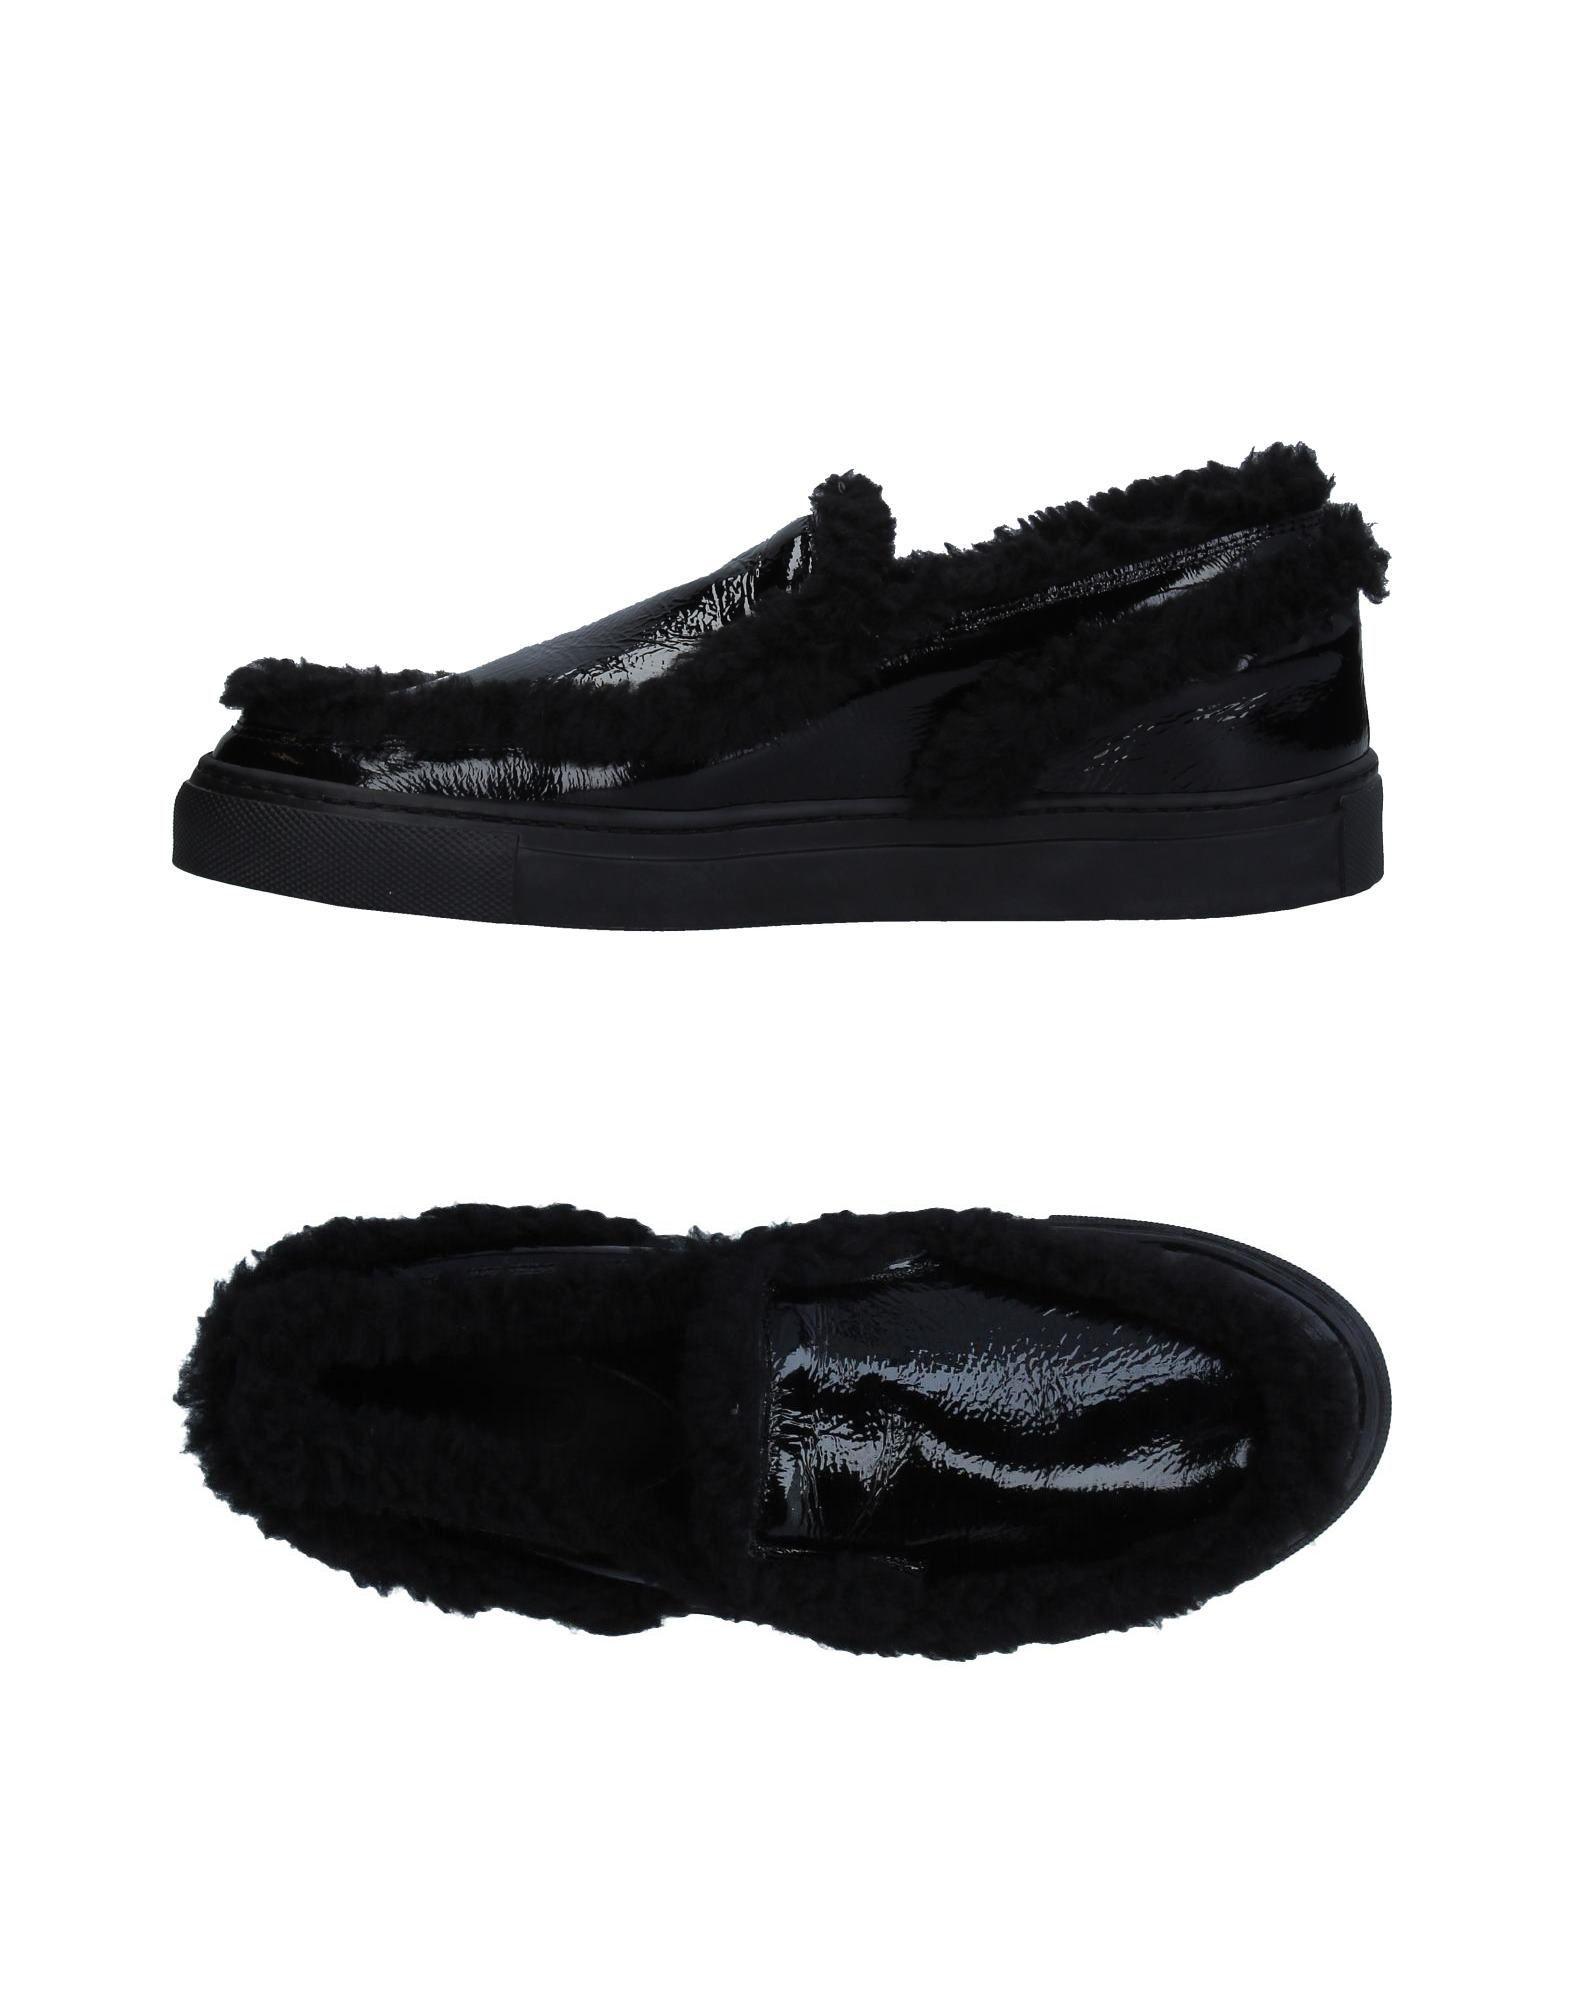 Zapatillas Mm6 Maison Margiela Mujer - Mm6 Zapatillas Mm6 - Maison Margiela  Negro 0b5dbc